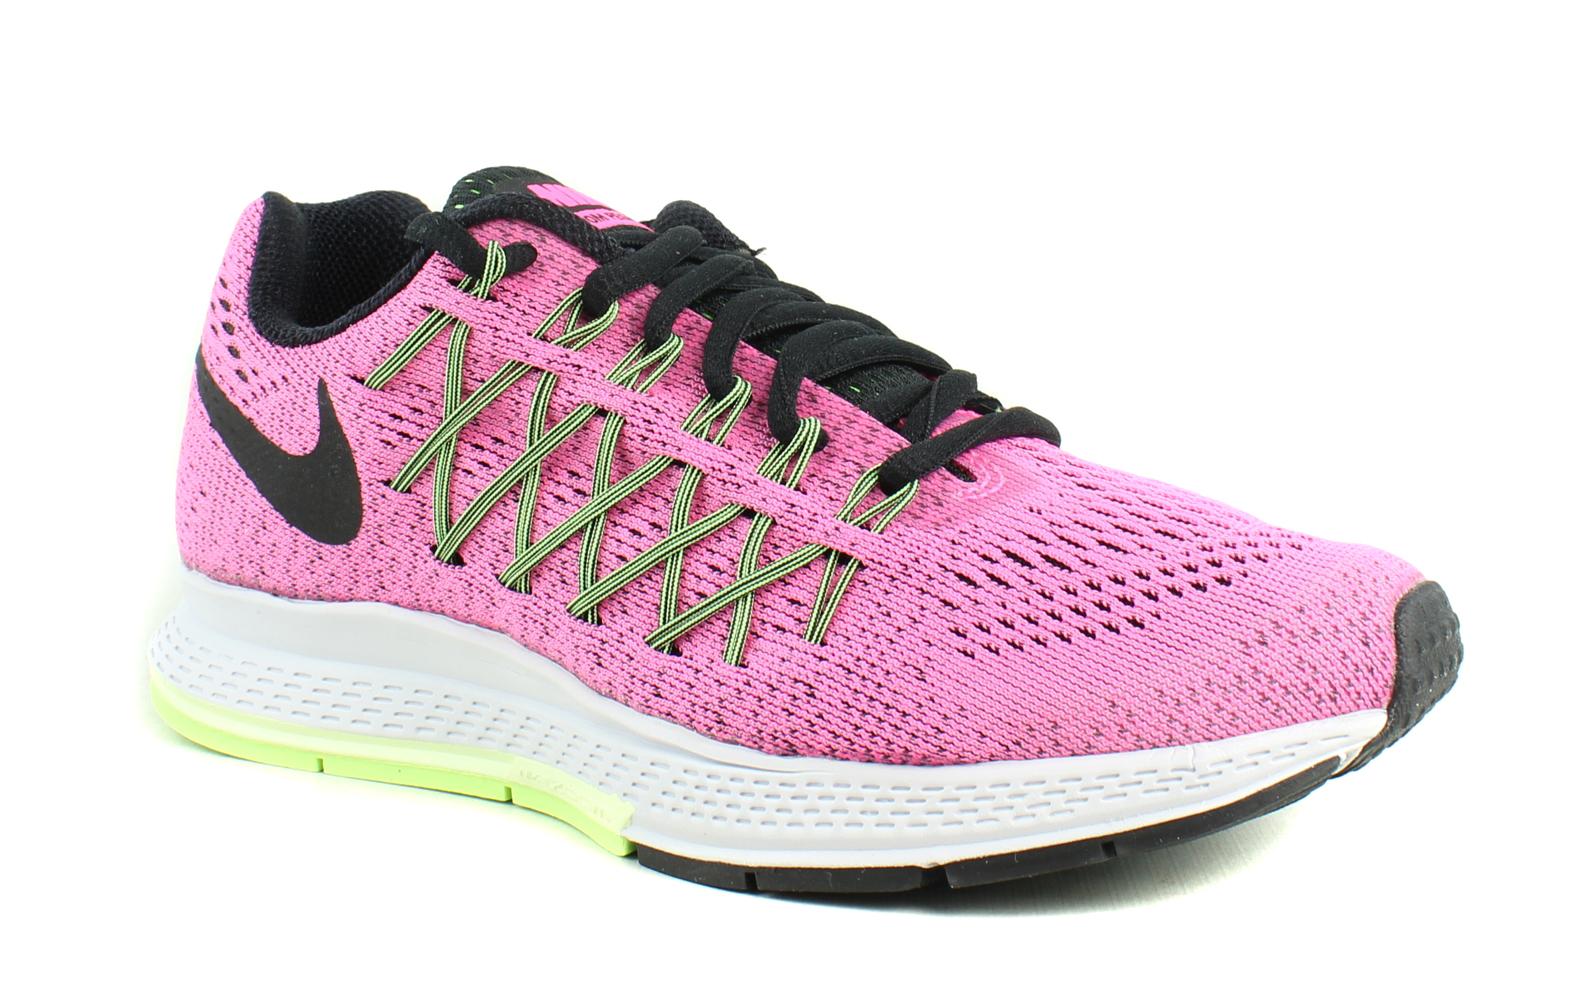 info for a9eec 528b0 ... latest fashion e07c8 c2072 New Nike Womens Air Zoom Pegasus 32 (W)  PinkPowBlackBrlyVoltGhstGreen Running ...